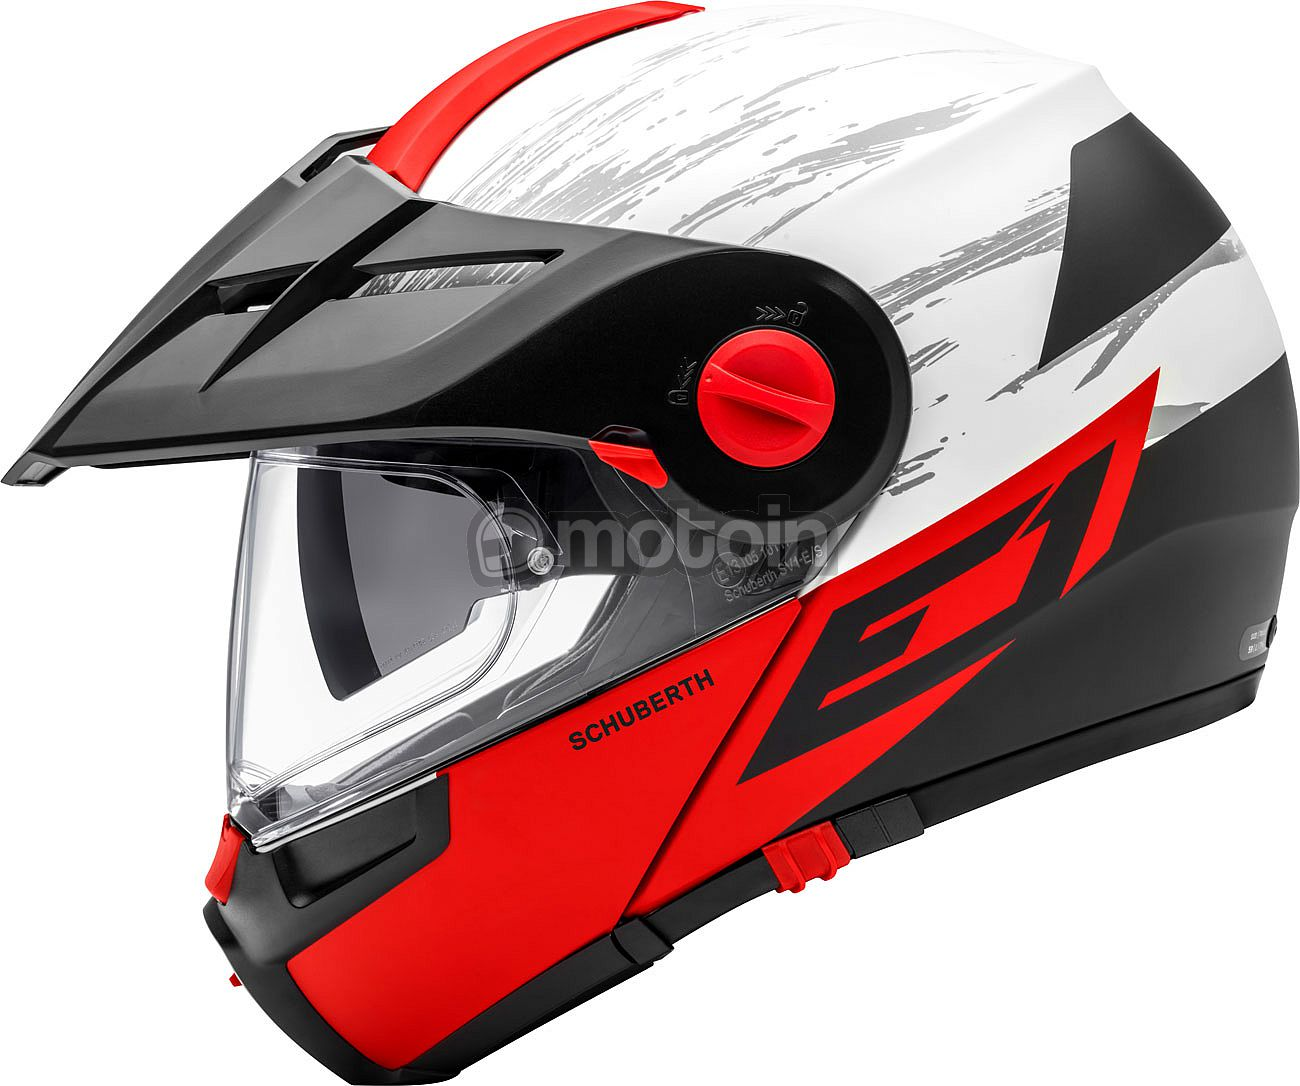 9bba1823 Schuberth E1 Crossfire, flip up helmet - motoin.de